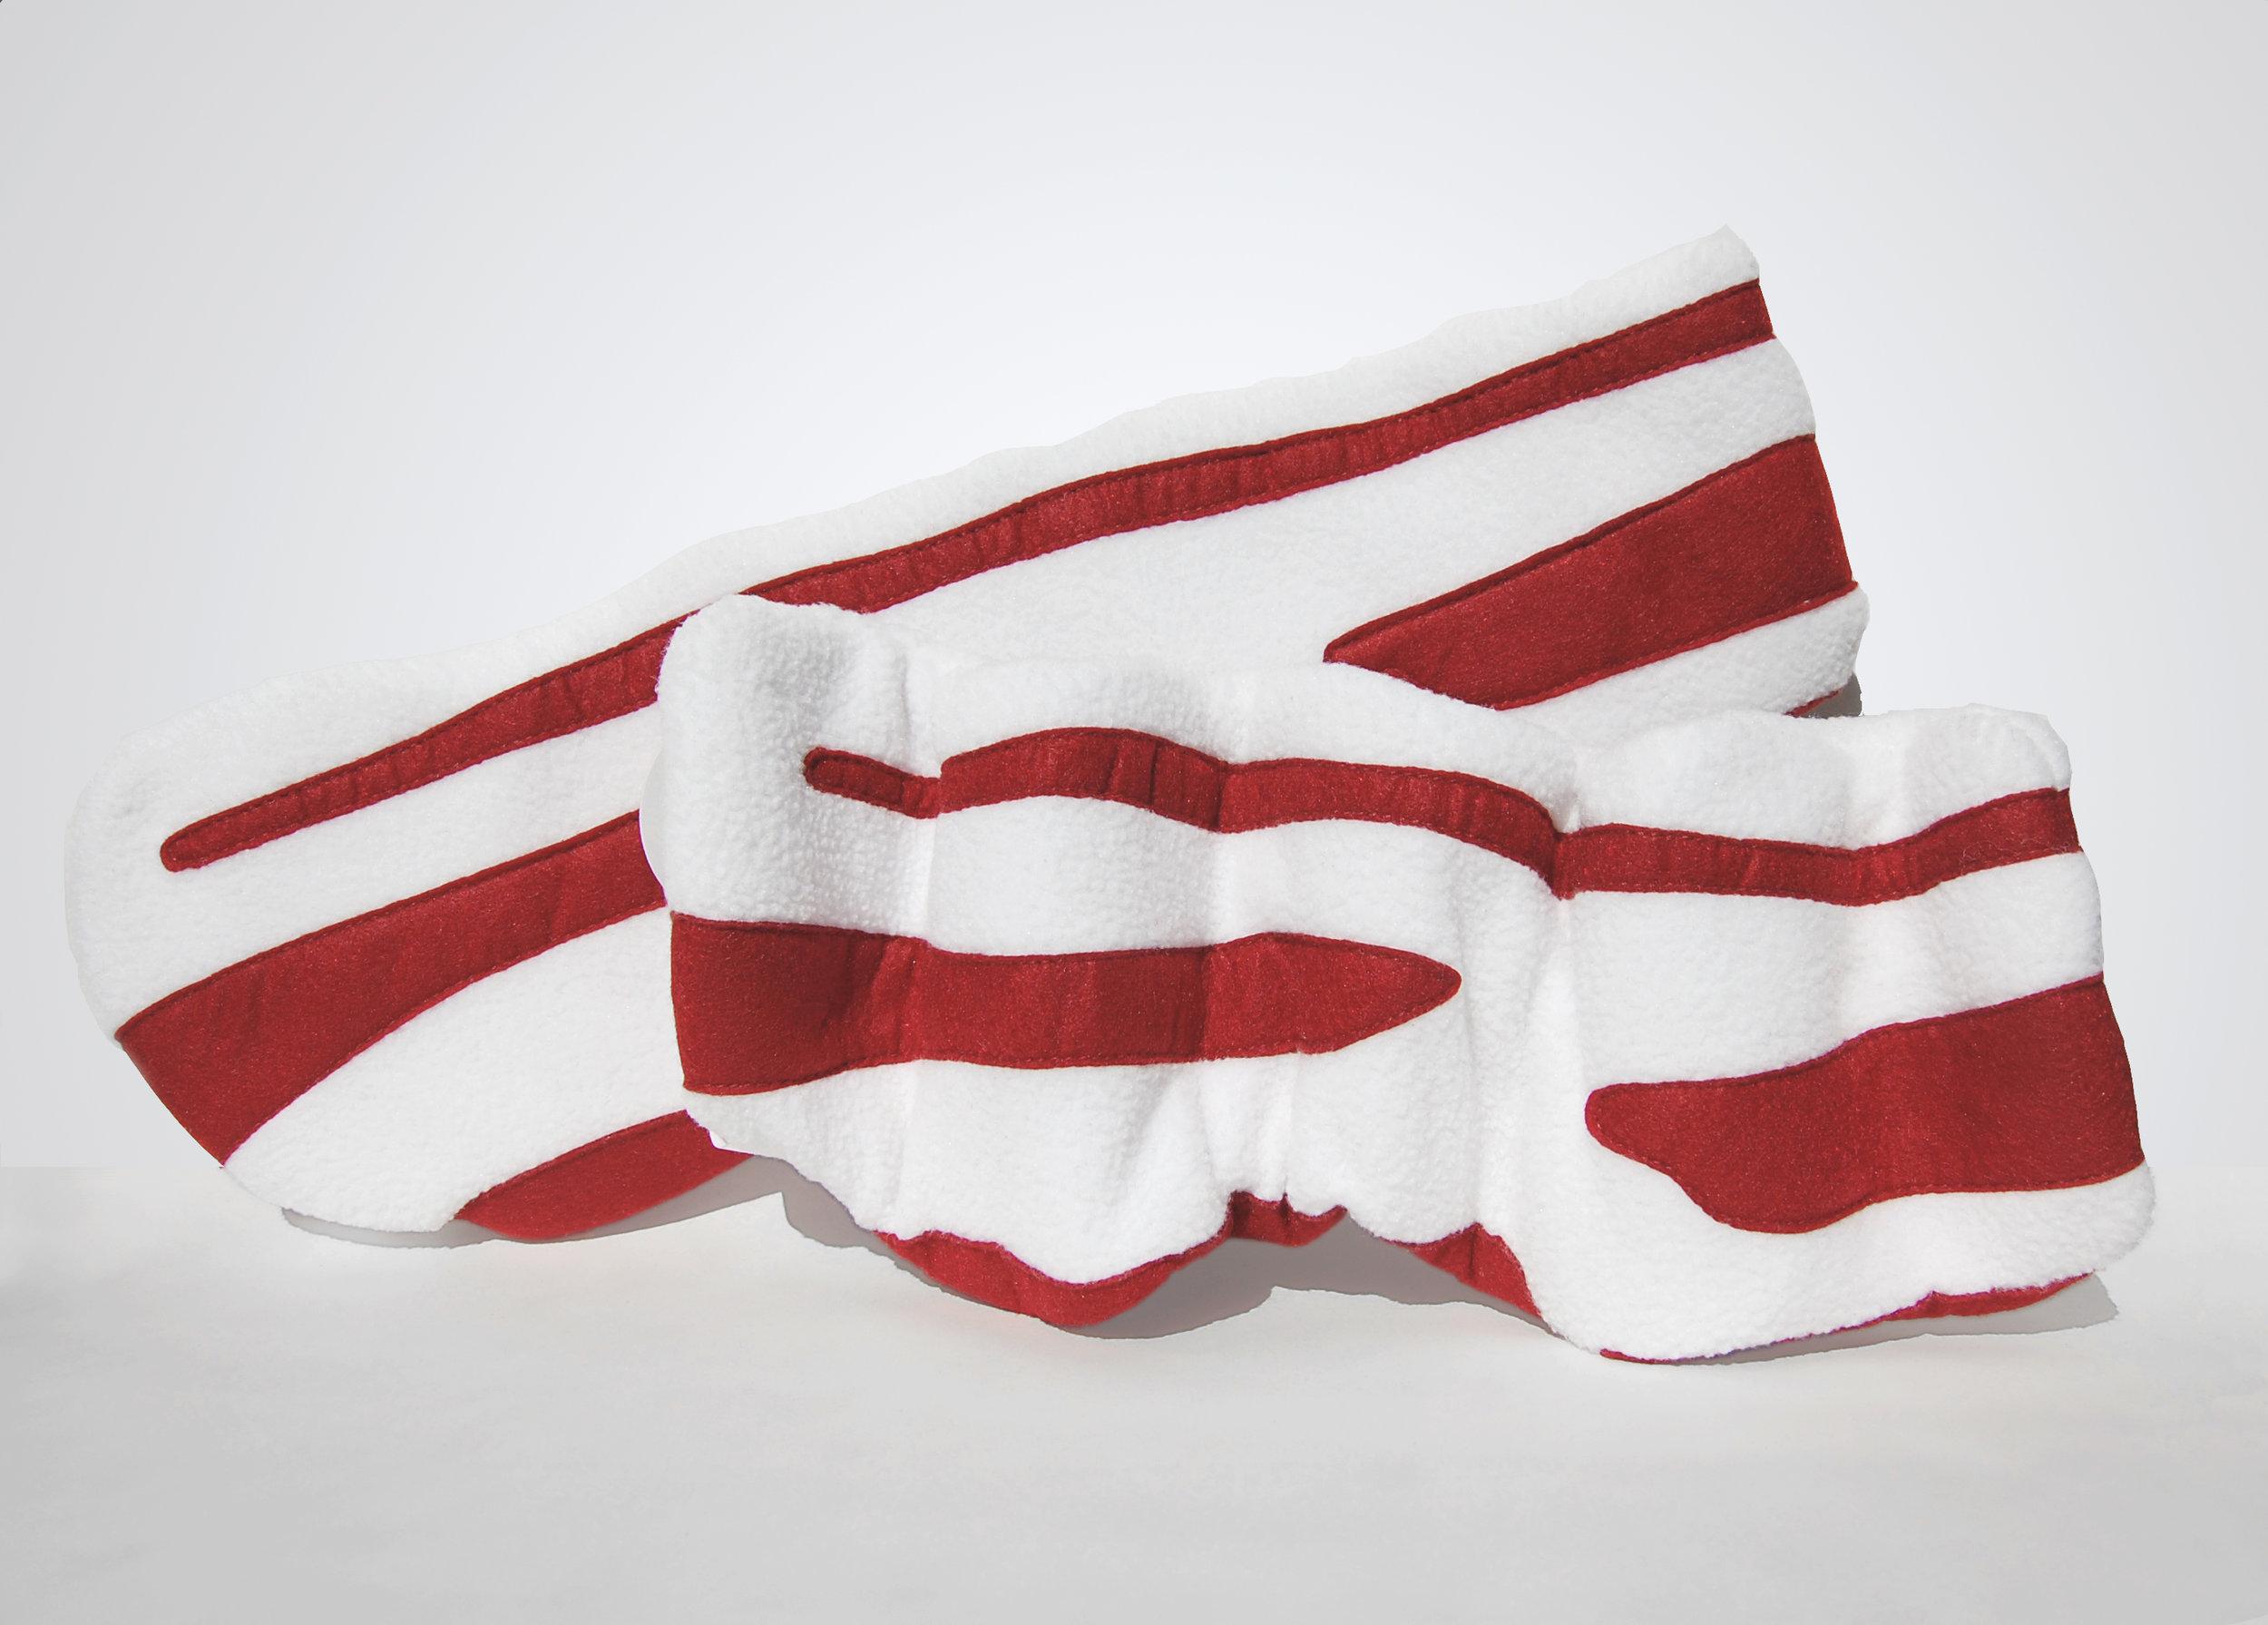 Shapin' Bacon - Fleece, felt, polyester fiberfill stuffing, polyester thread, wire armatureApprox. 15